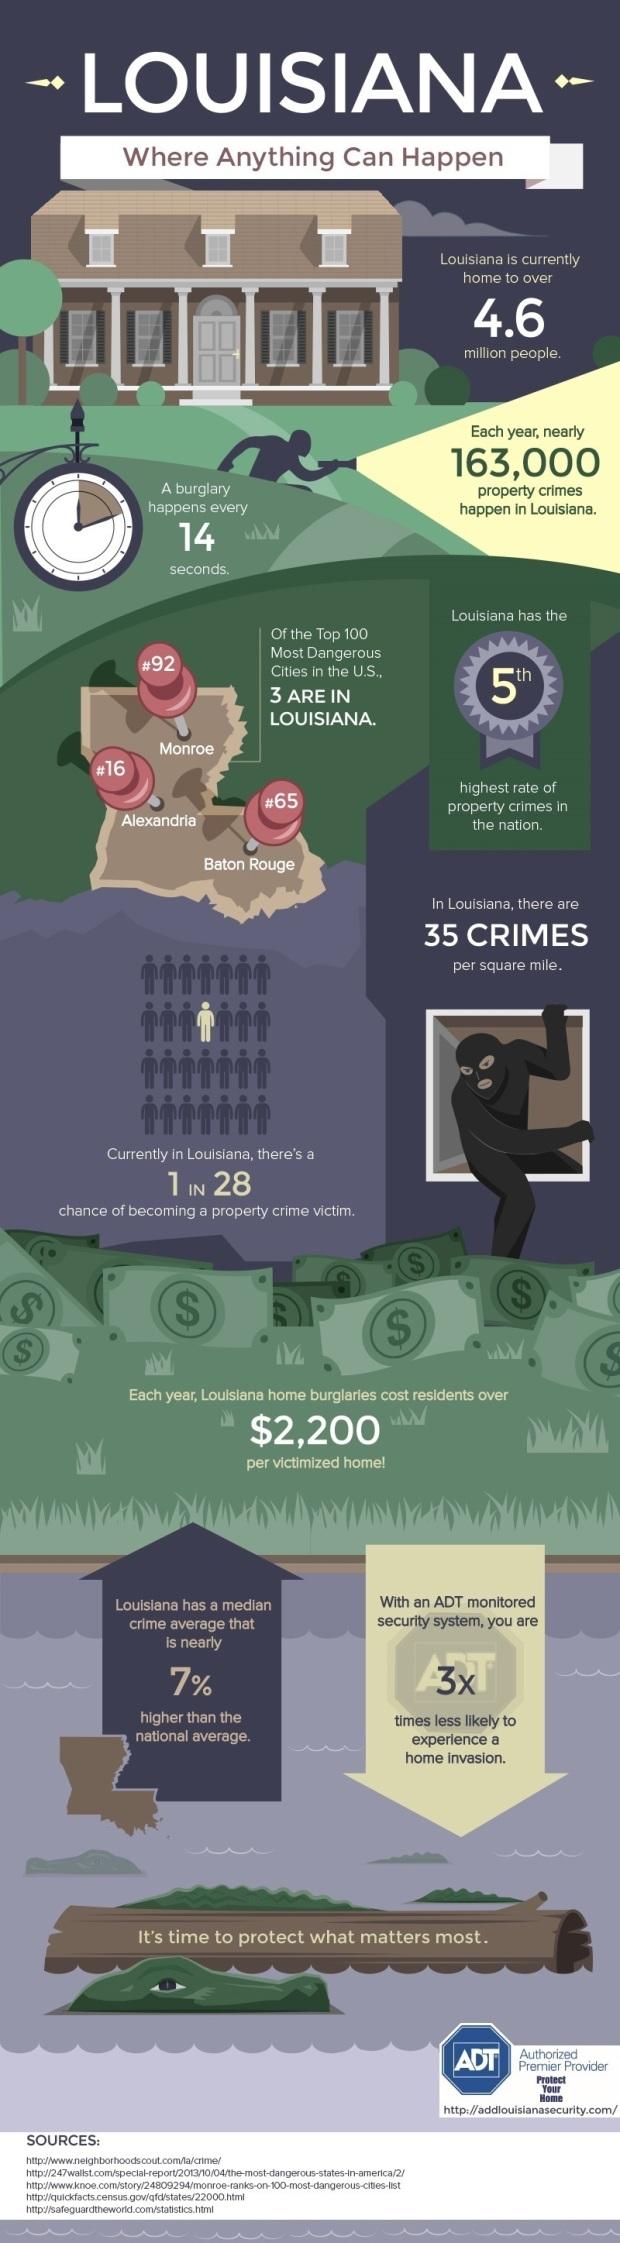 Lousiana-infographic